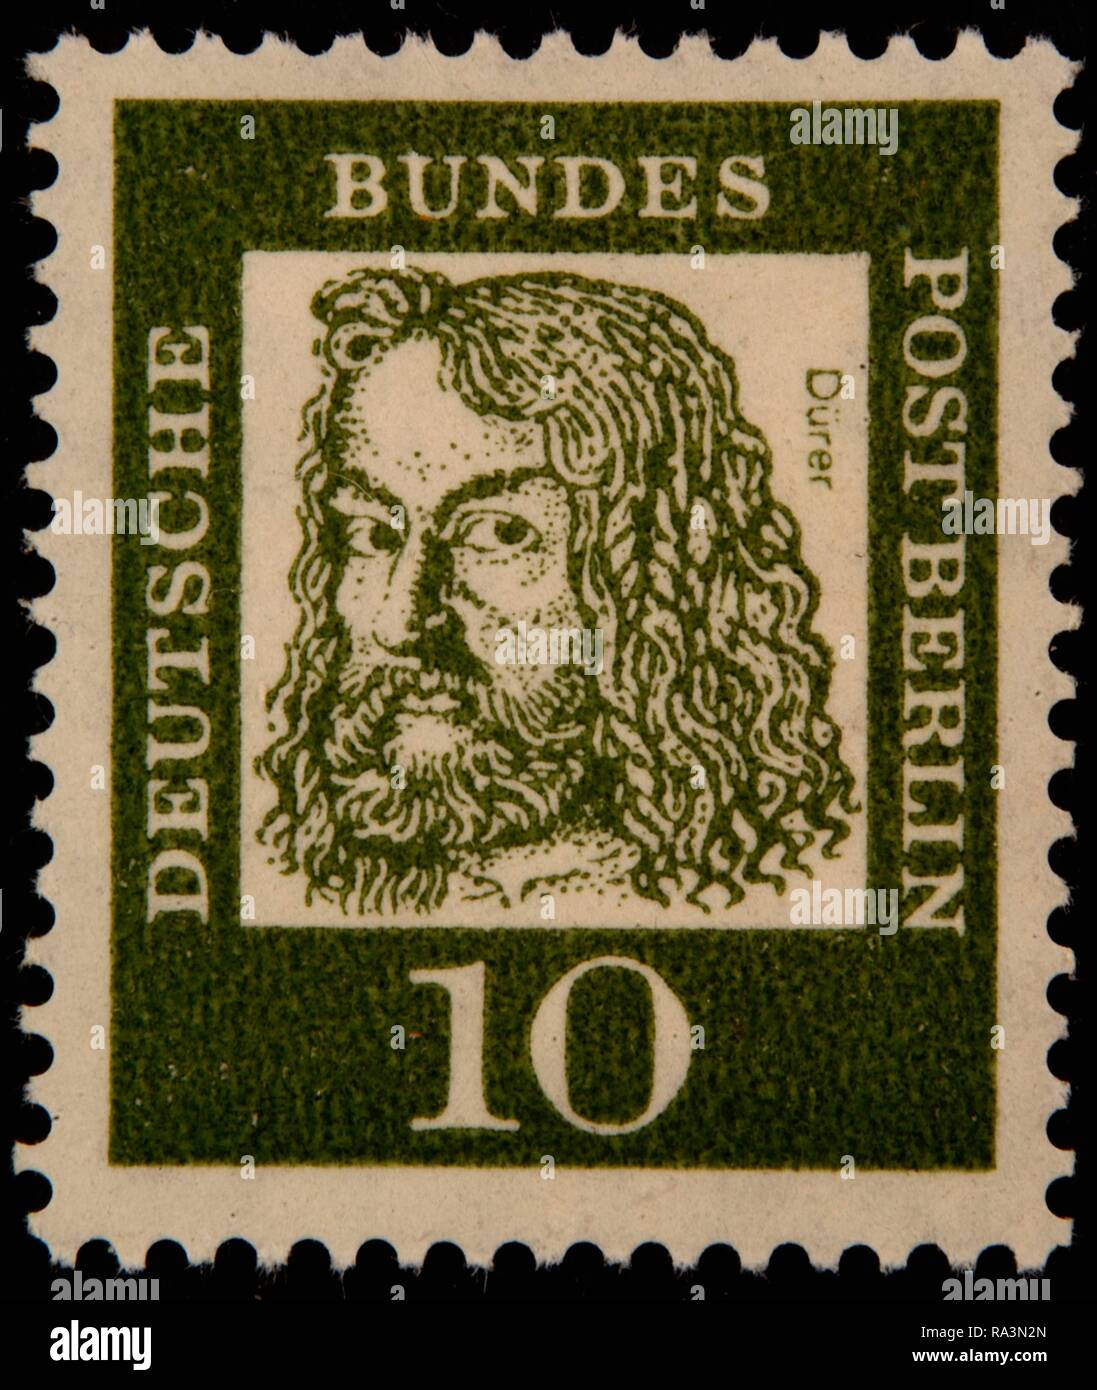 Albrecht Dürer, a German painter, printmaker, and theorist of the German Renaissance, portrait on a German stamp, Germany - Stock Image